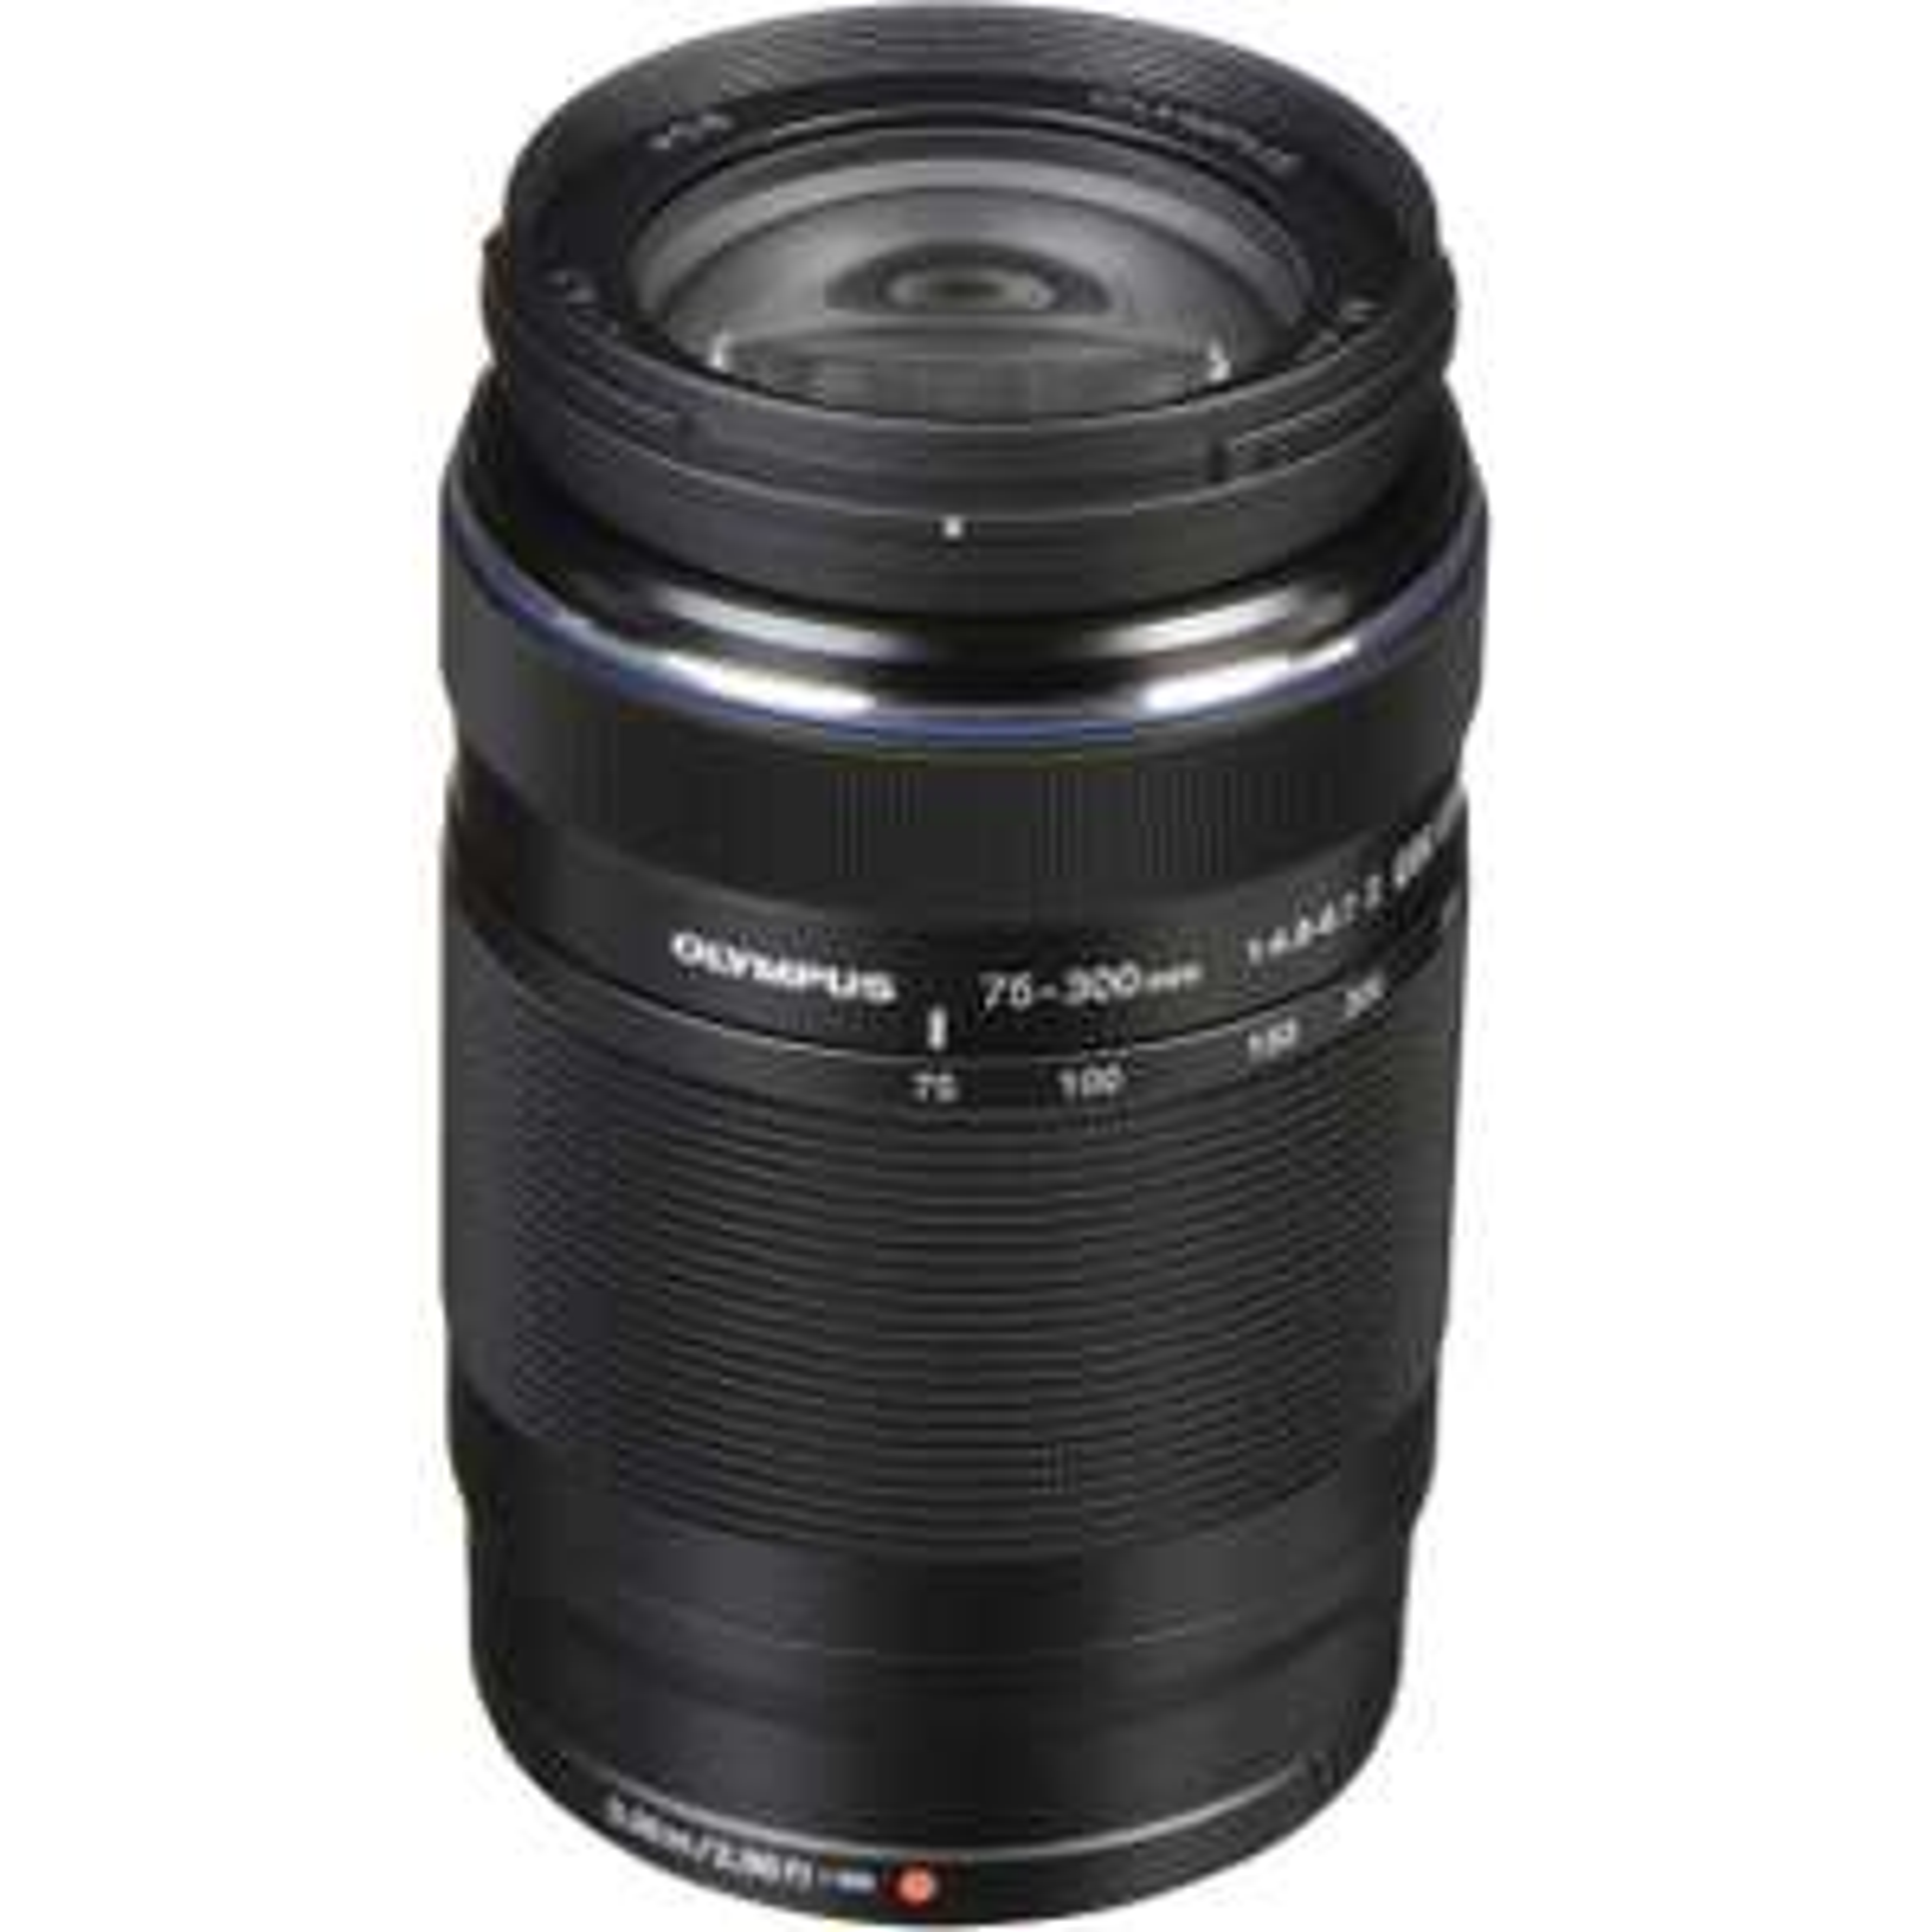 Olympus M.Zuiko 75-300mm  f/4.8 Supertelephoto Lens (600mm 35mm equivalent) £199.95 + p&p with eBay code